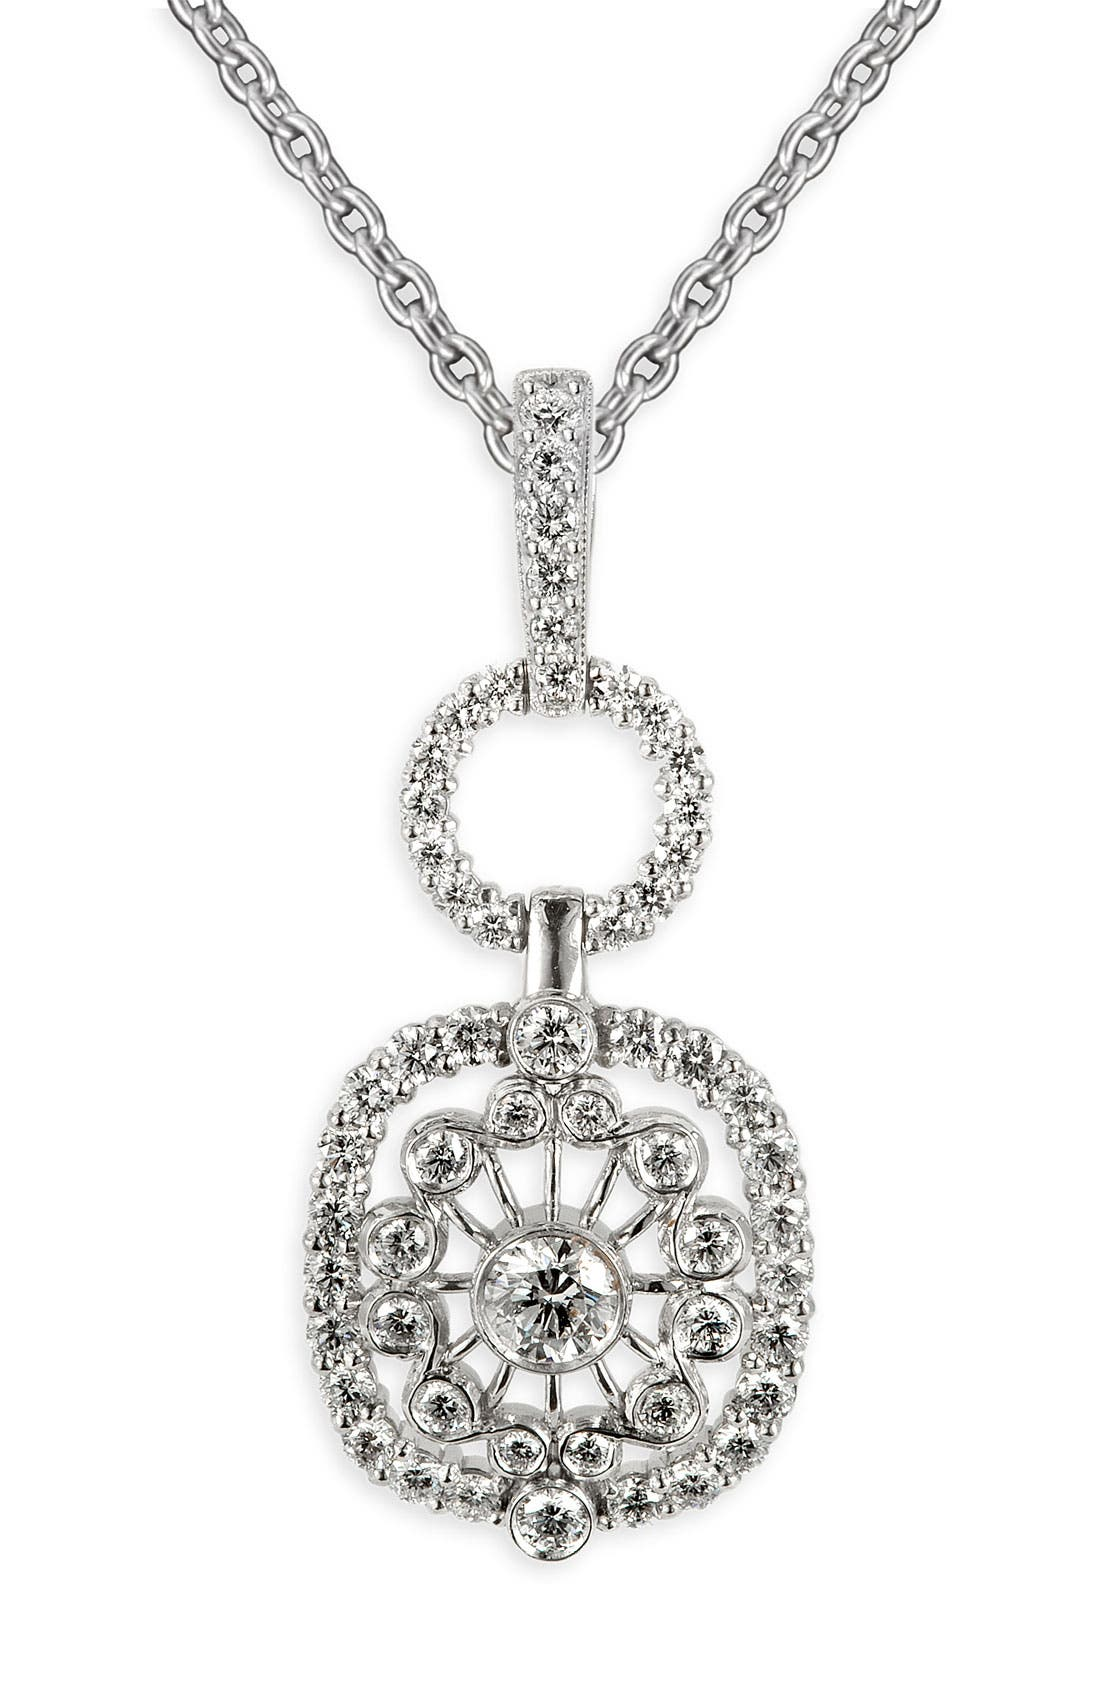 Main Image - Jack Kelége 'Byzantine' Diamond Pendant Necklace